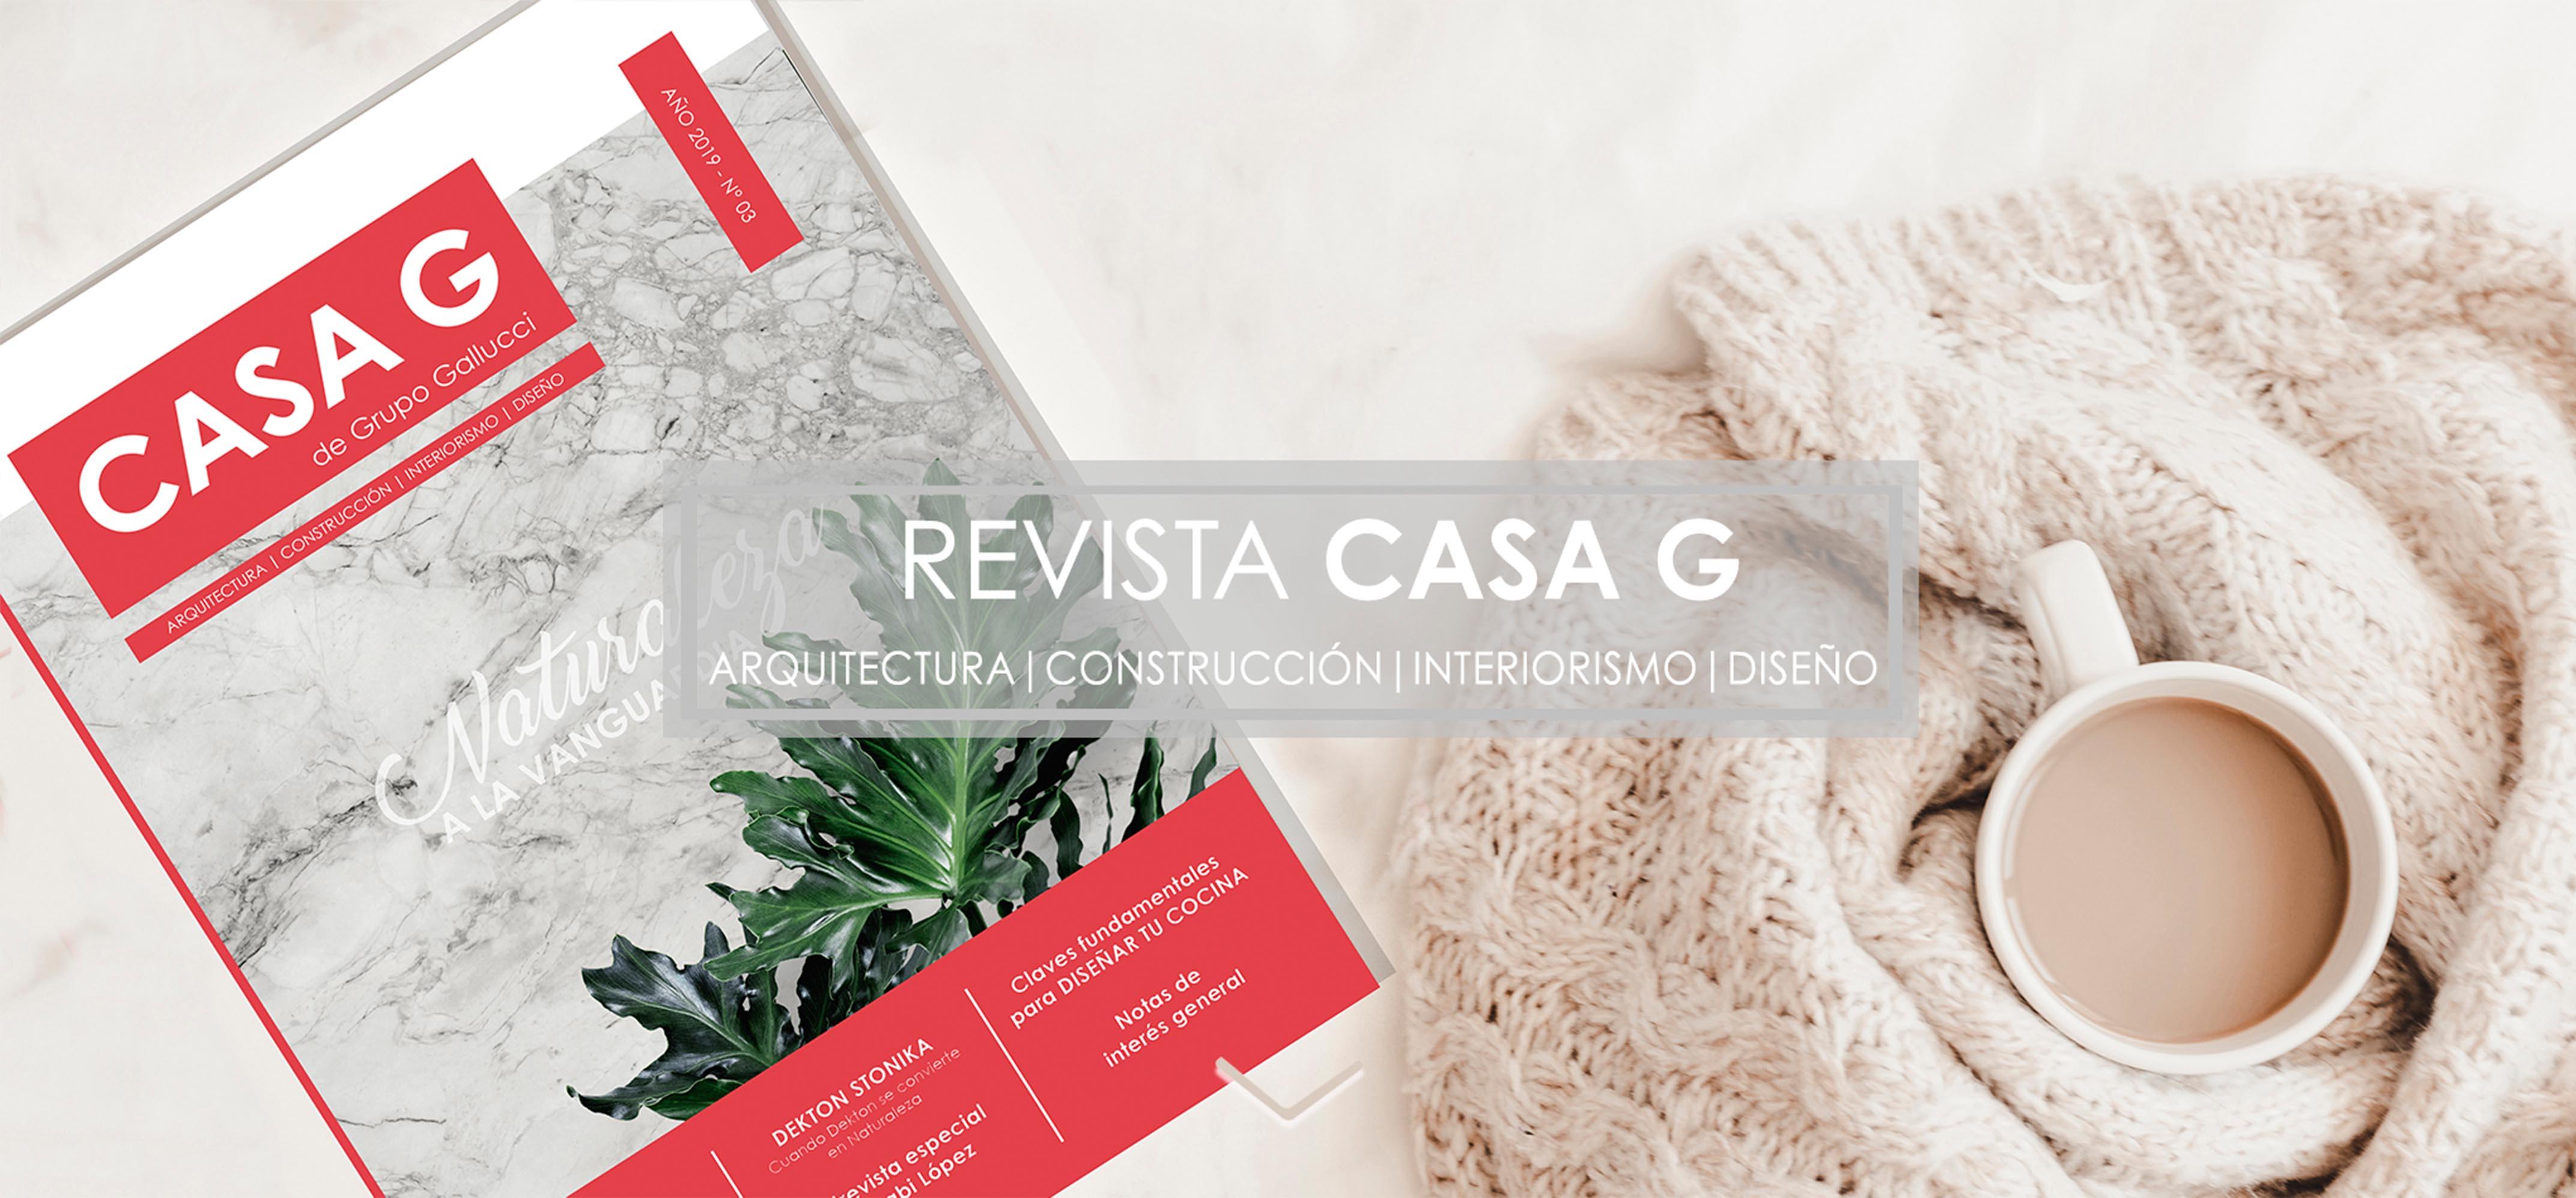 Revista Casa G - Grupo Gallucci